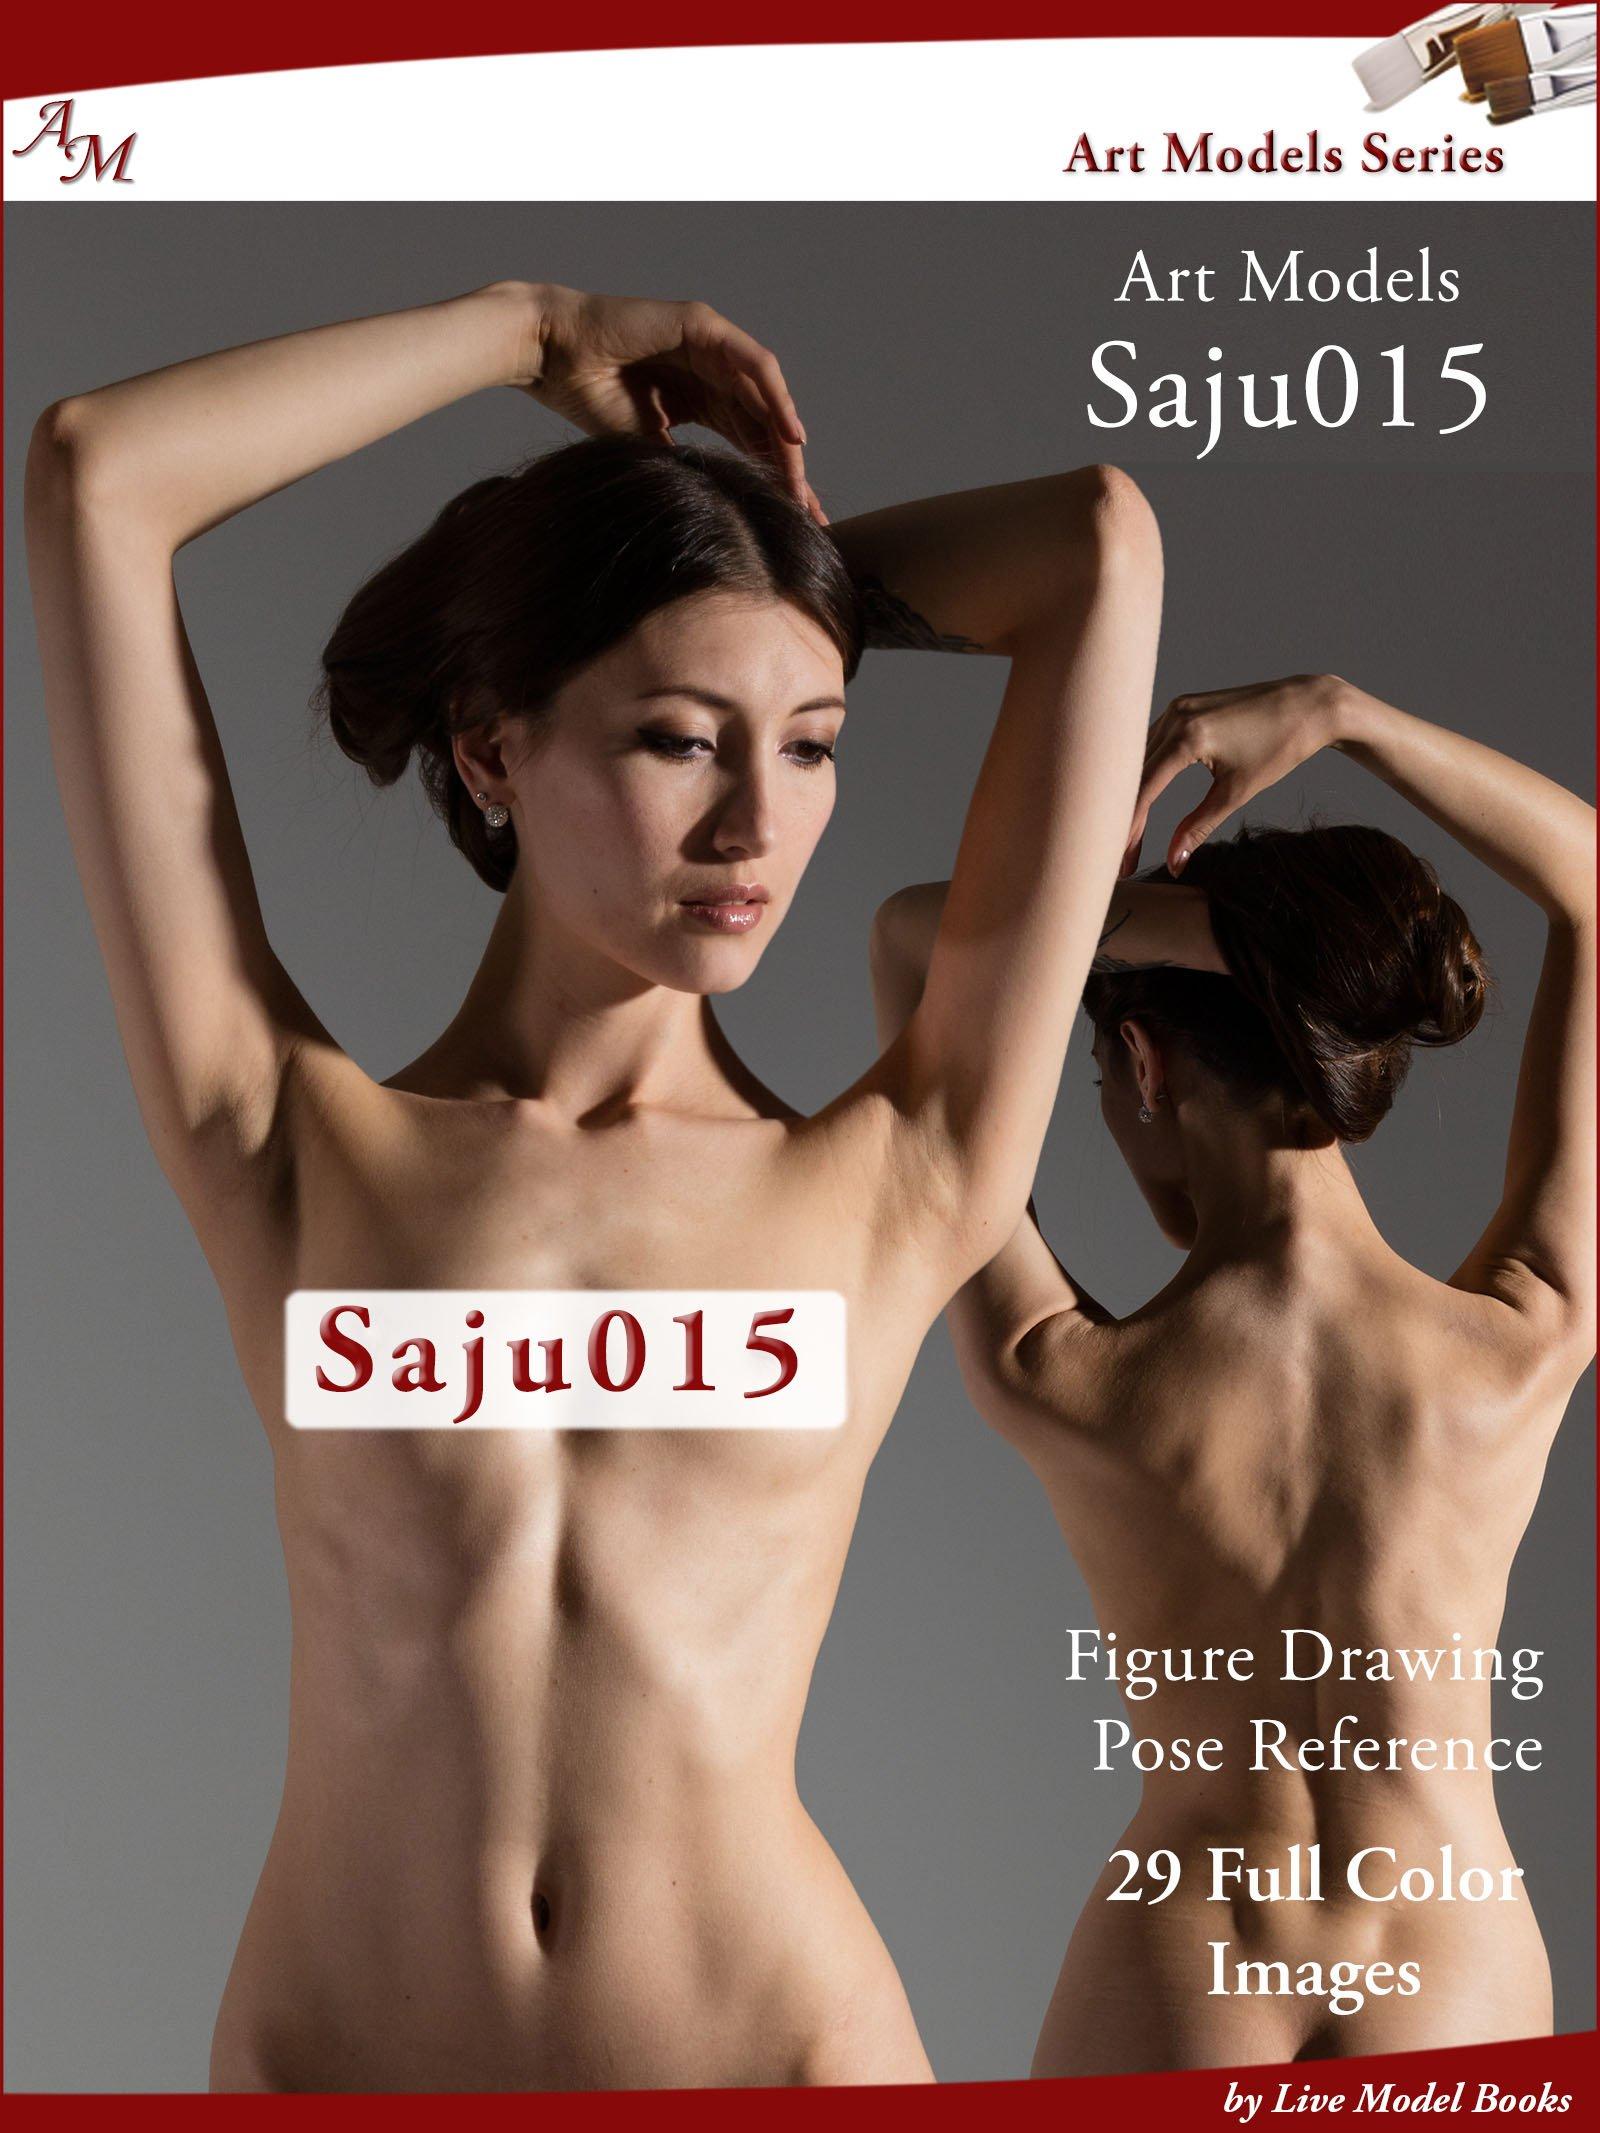 Art Models Saju015 Figure Drawing Pose Reference Art Models Poses Buy Online In Guernsey At Desertcart